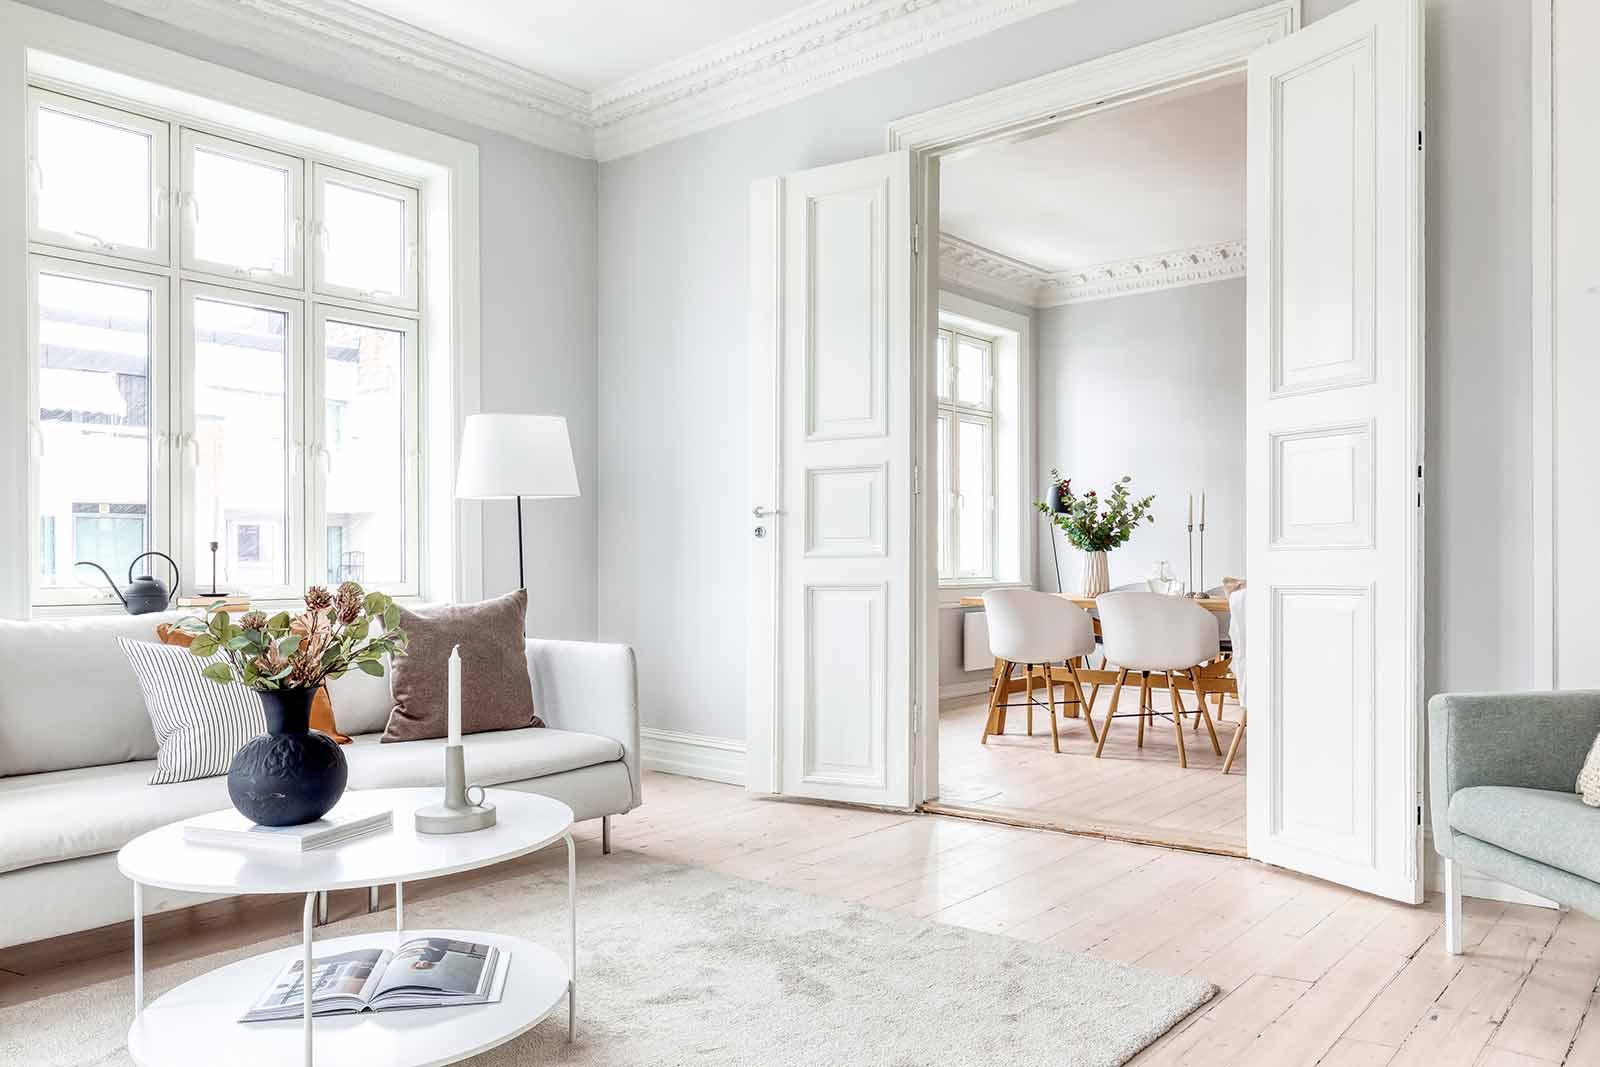 boligstyling interiørdesign stue